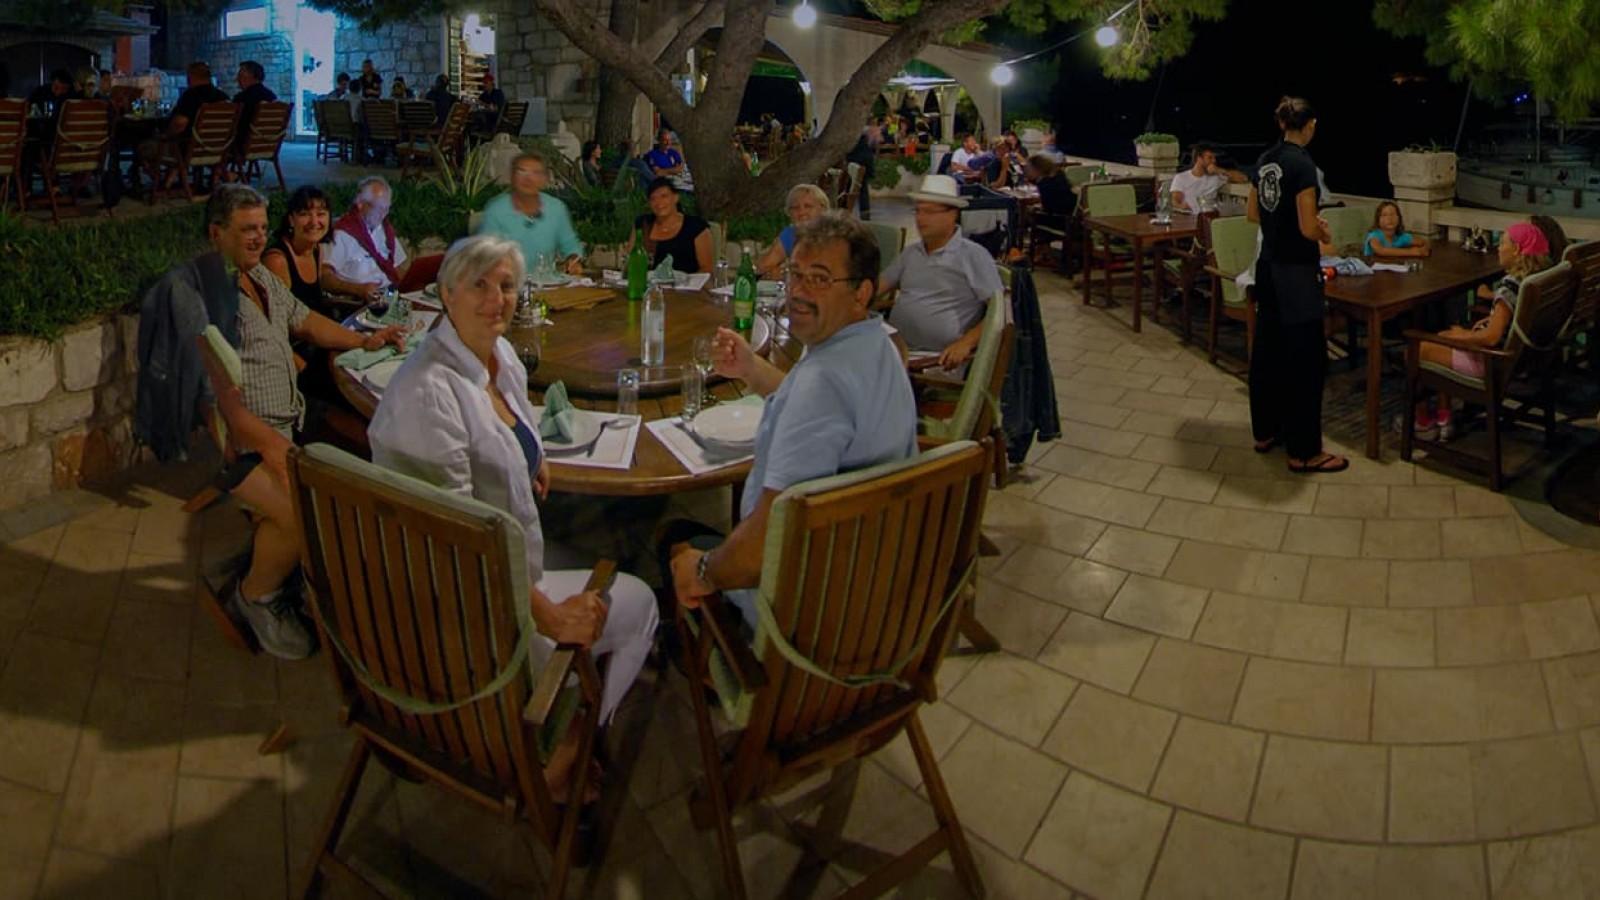 Porto Rosso restoran po noći